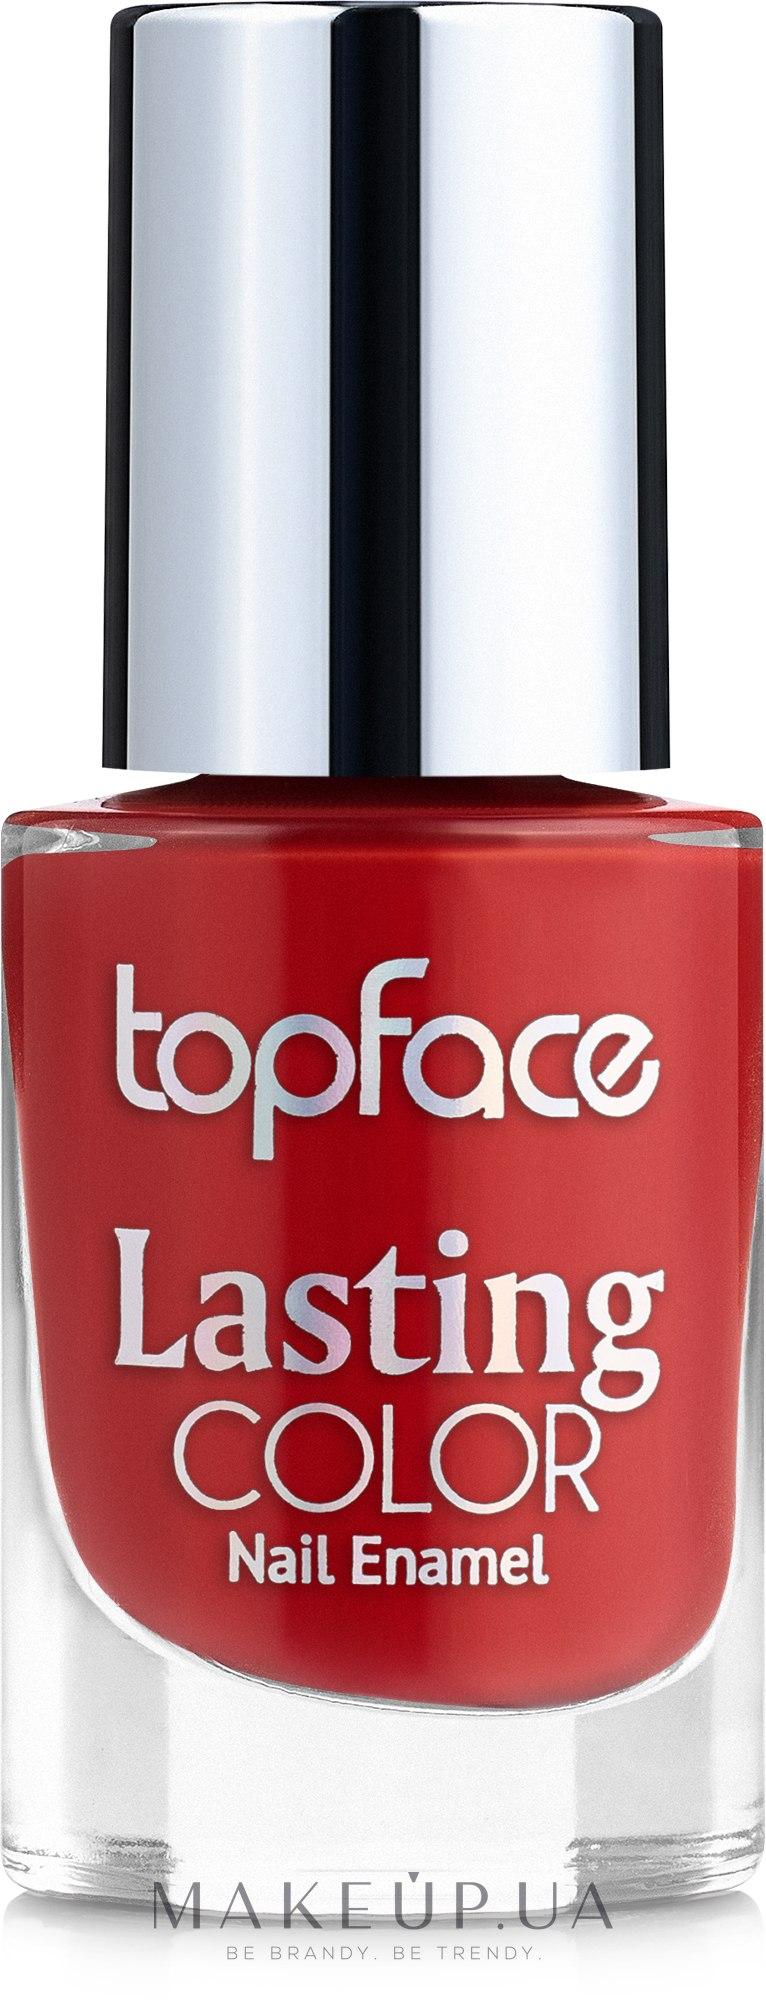 Лак для ногтей - Topface Lasting Color Nail Polish — фото N1